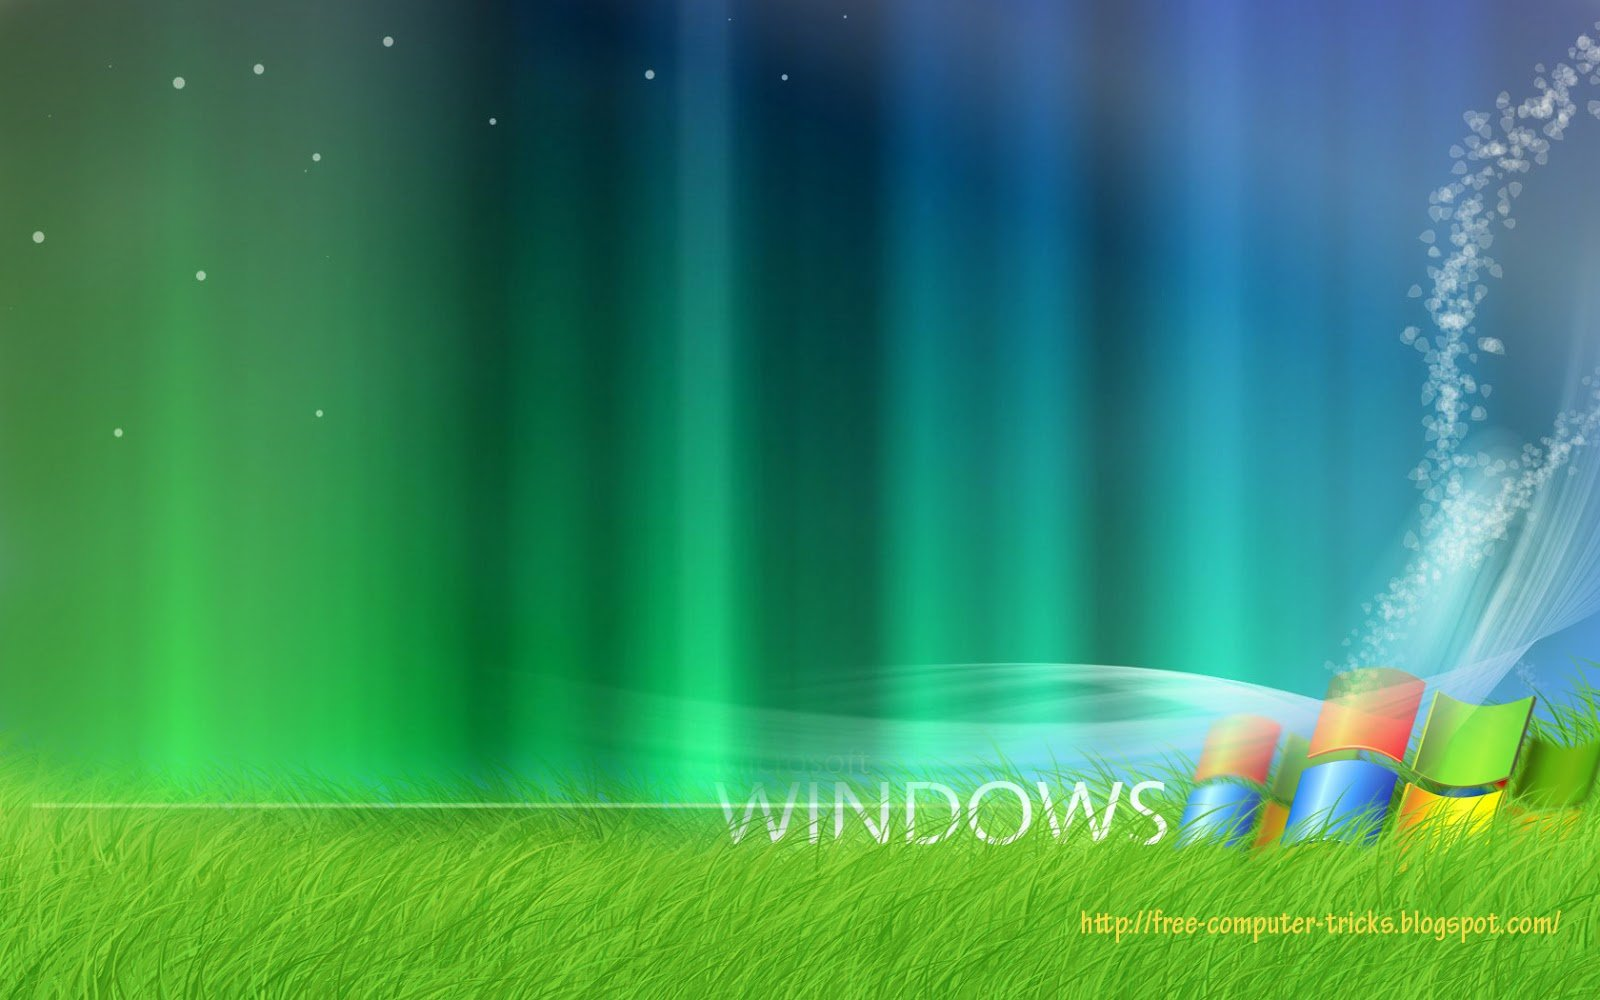 Windows 7 Wallpaper 1920 1080 Hdtv 1080p Windows 7 Imagini 1600x1000